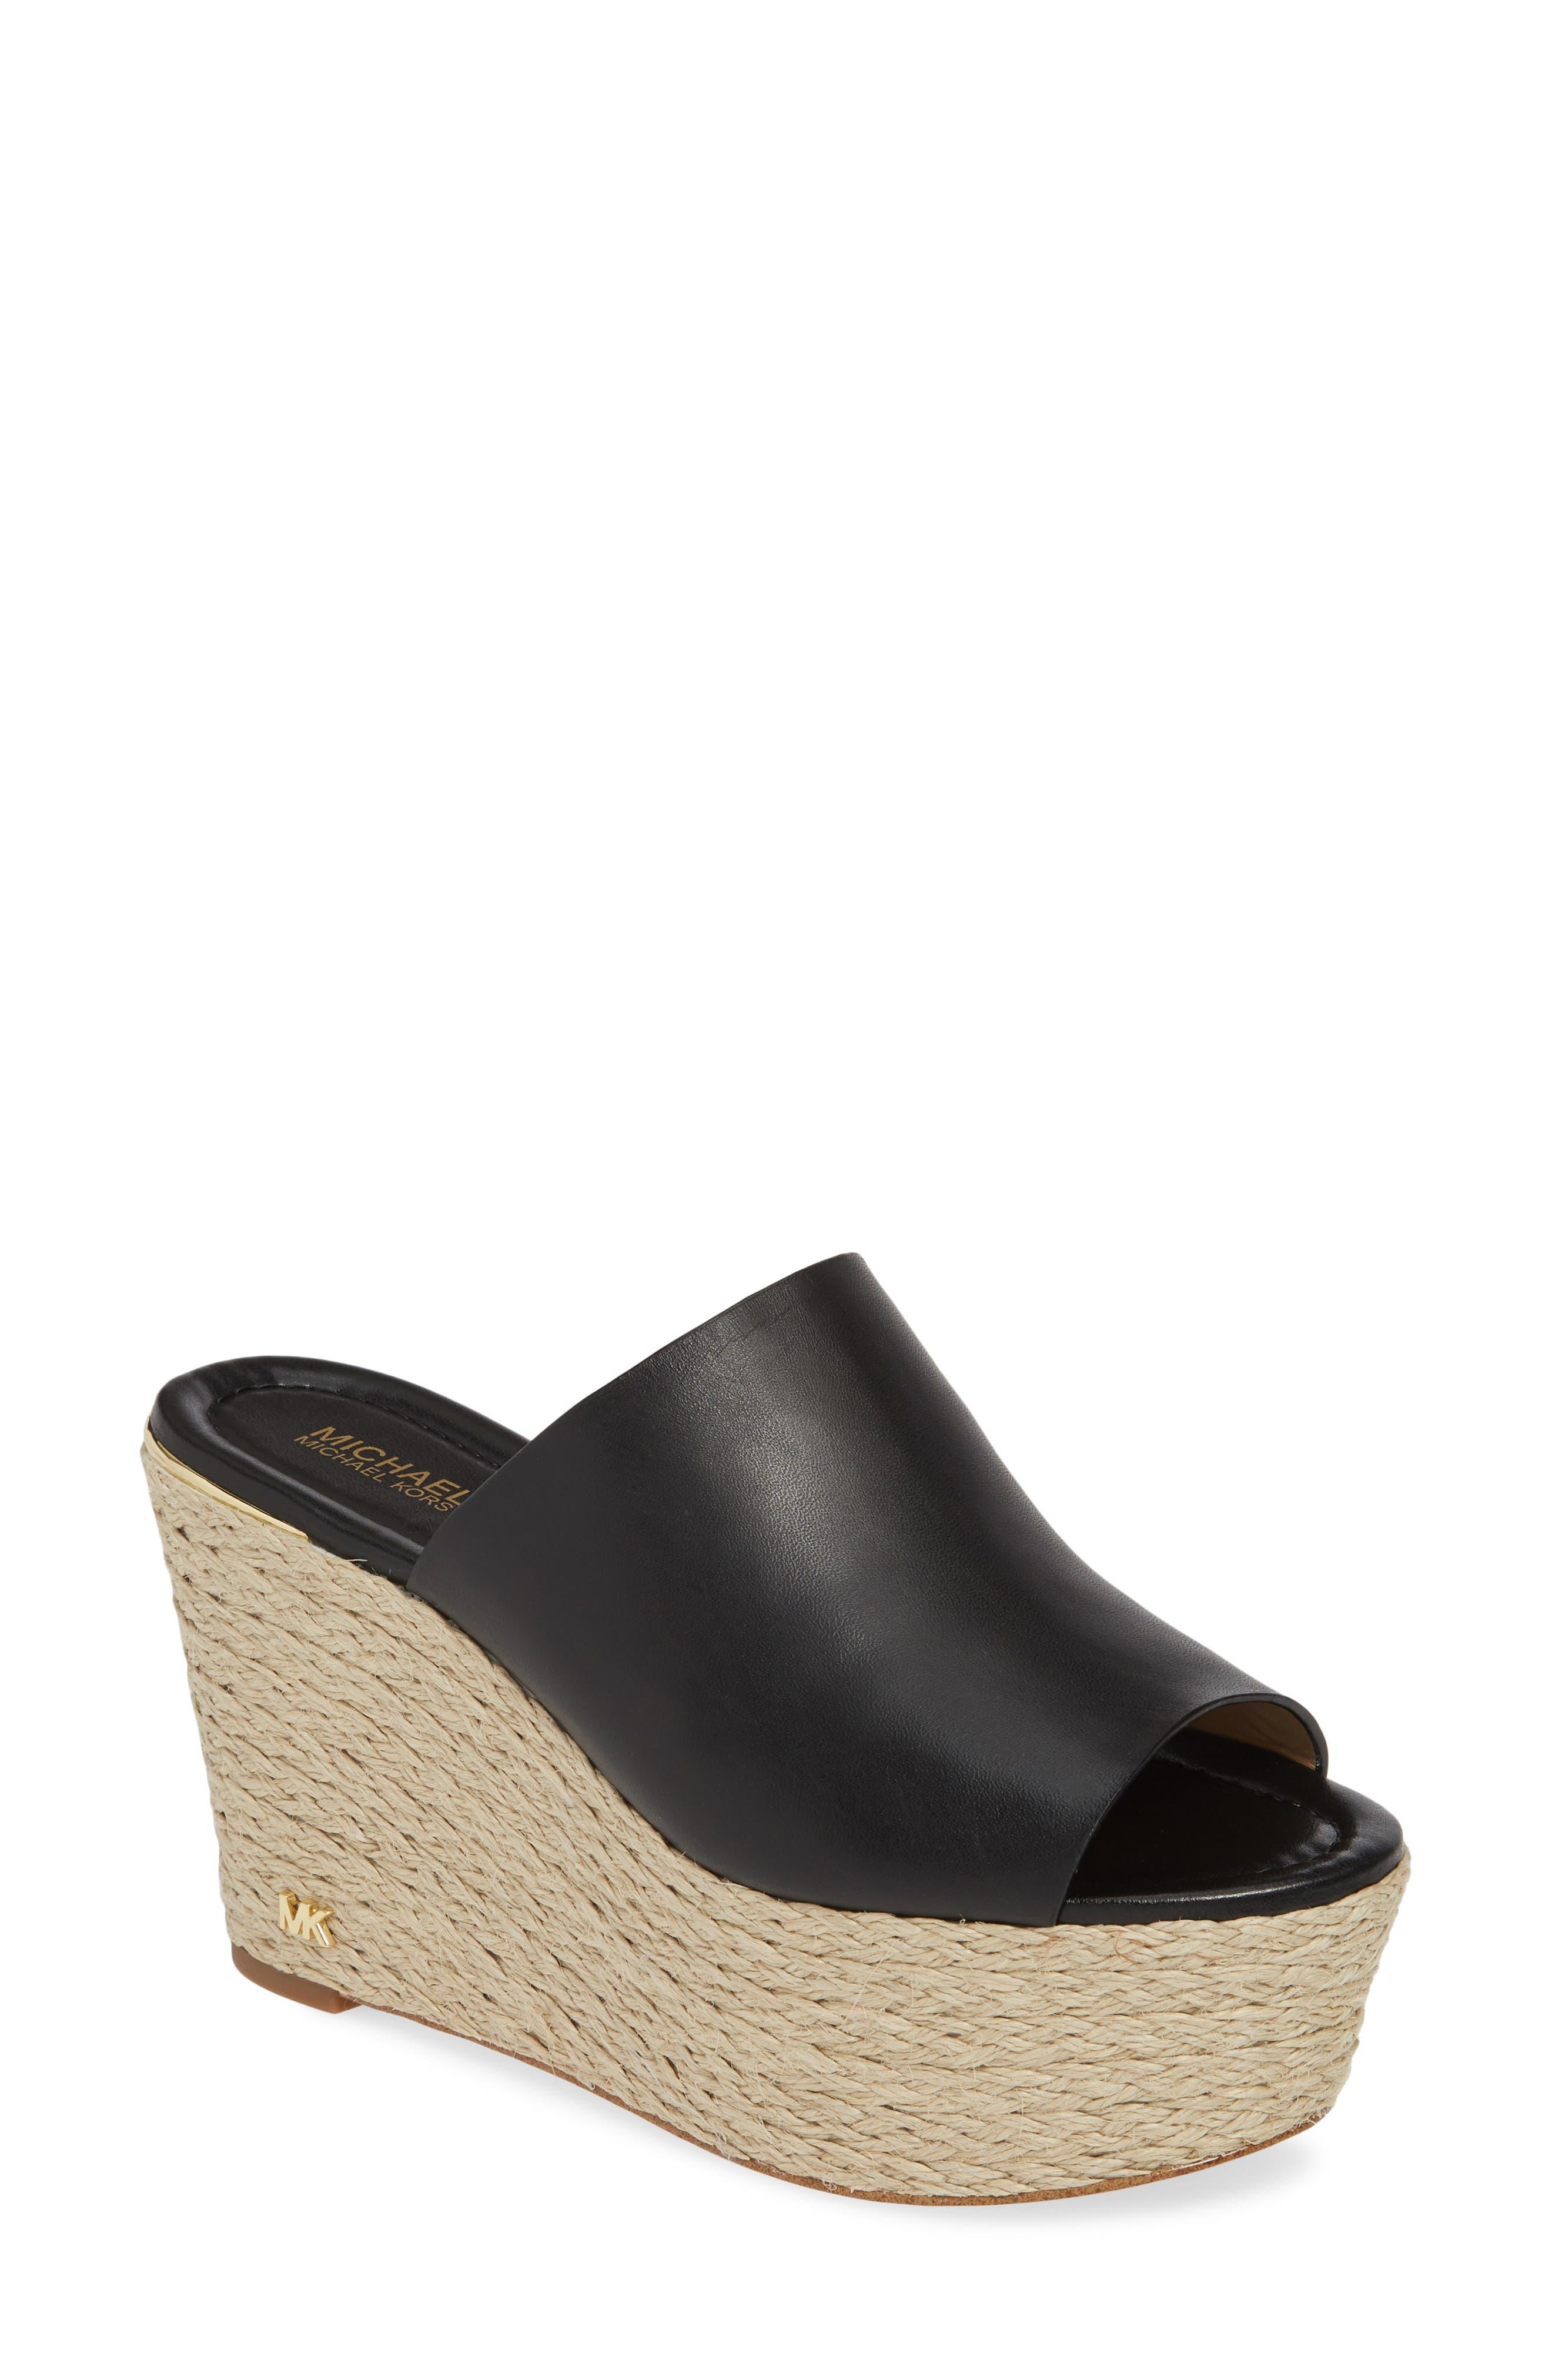 Cunningham Espadrille Wedge Slide Sandal, Main, color, BLACK VACHETTA LEATHER